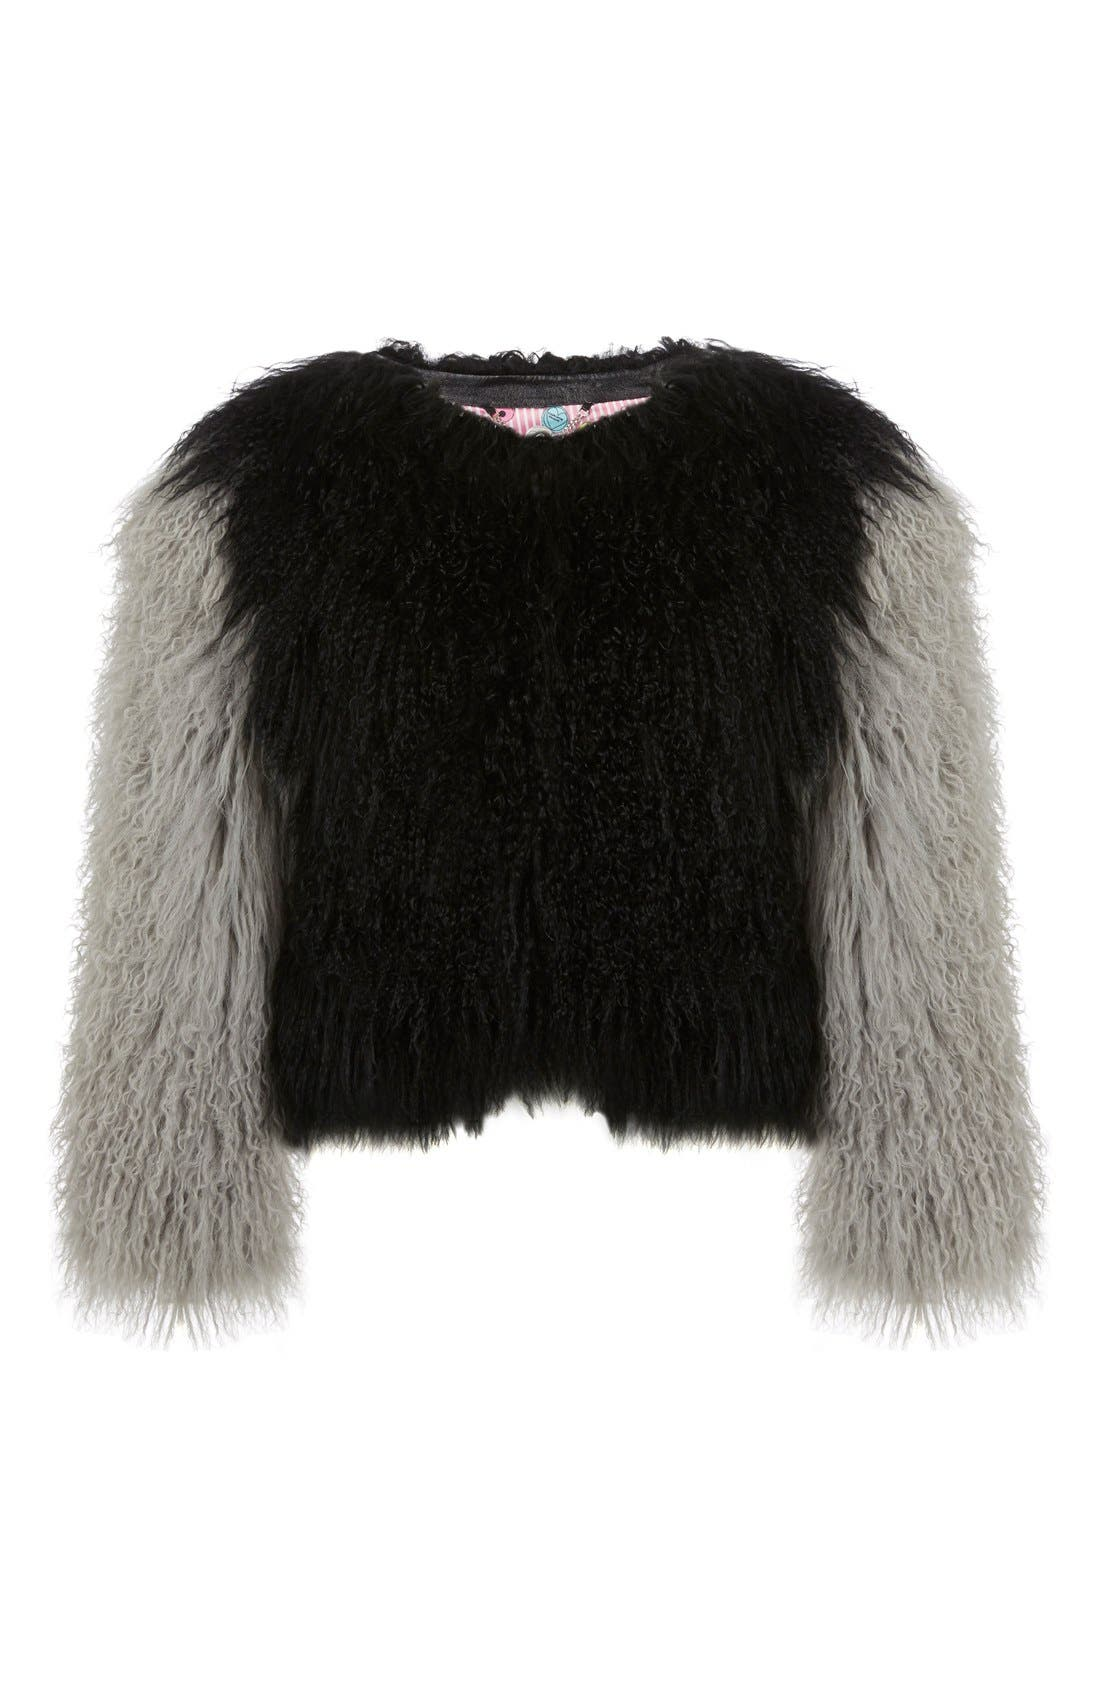 Alternate Image 1 Selected - Charlotte Simone 'Classic Fuzz' Genuine Mongolian Lamb Fur Bolero